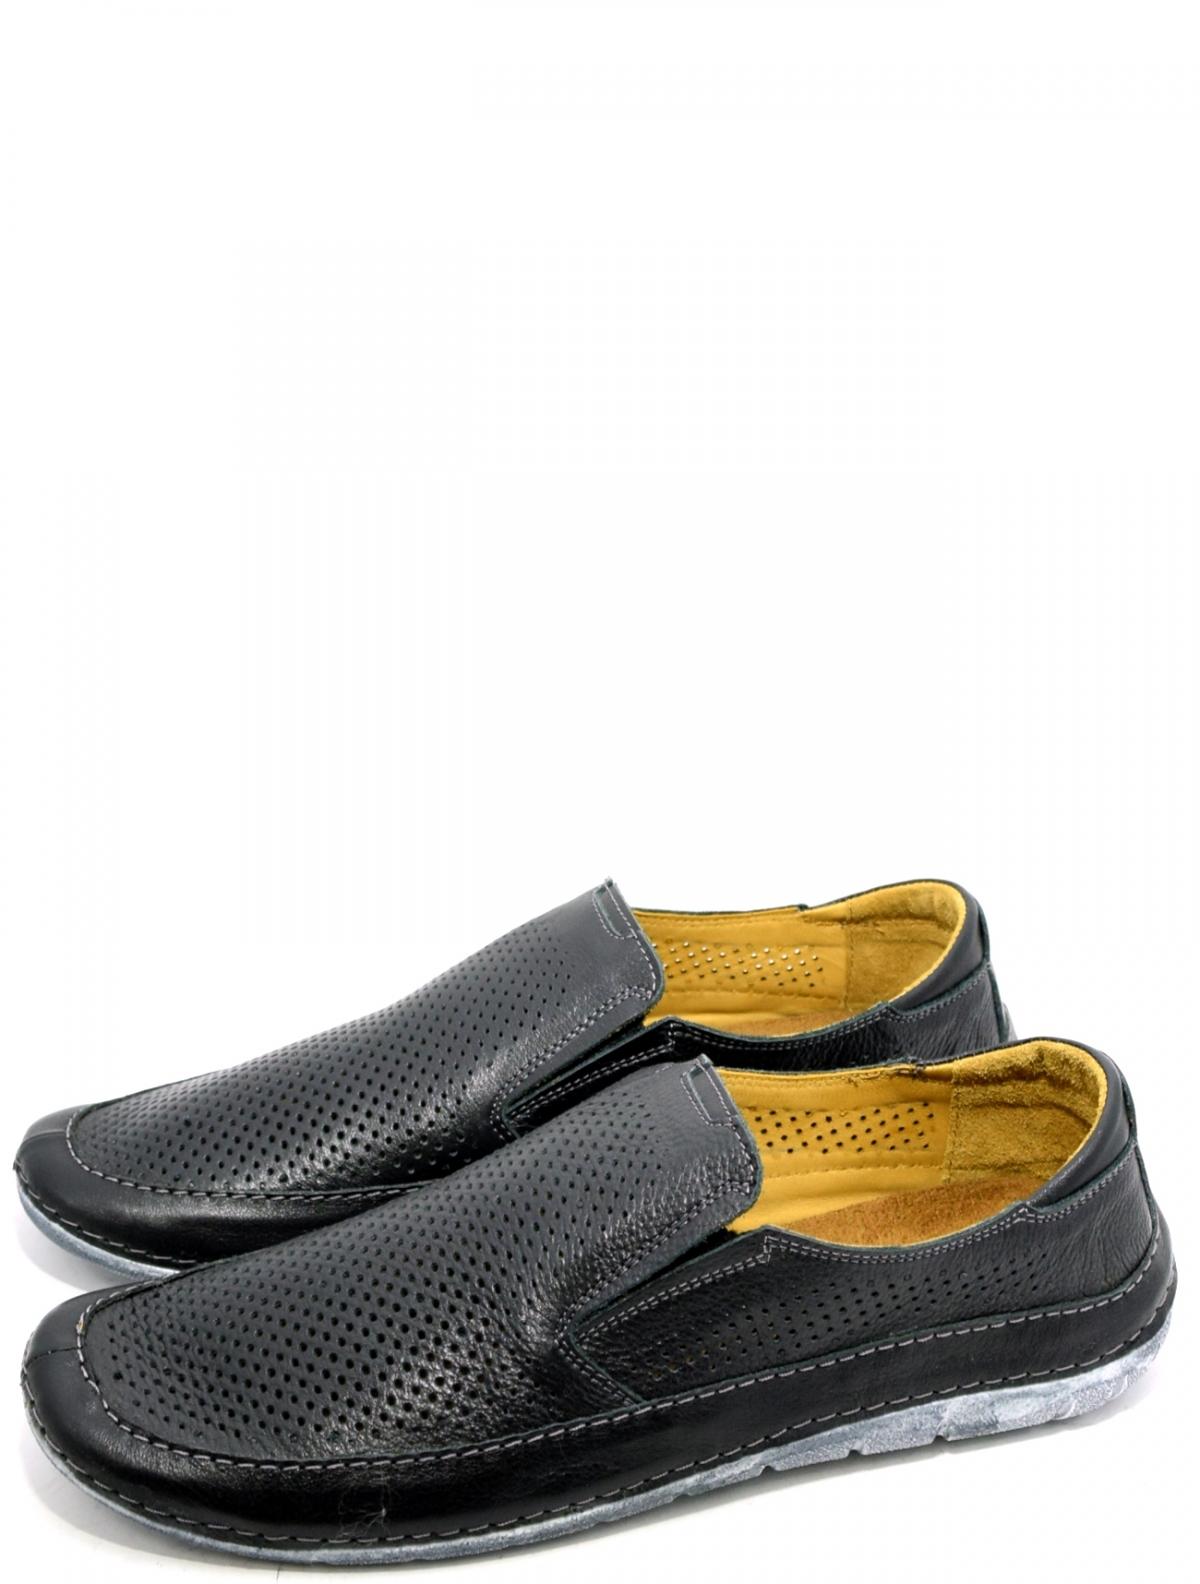 Bossner 1-329-100-5 мужские туфли